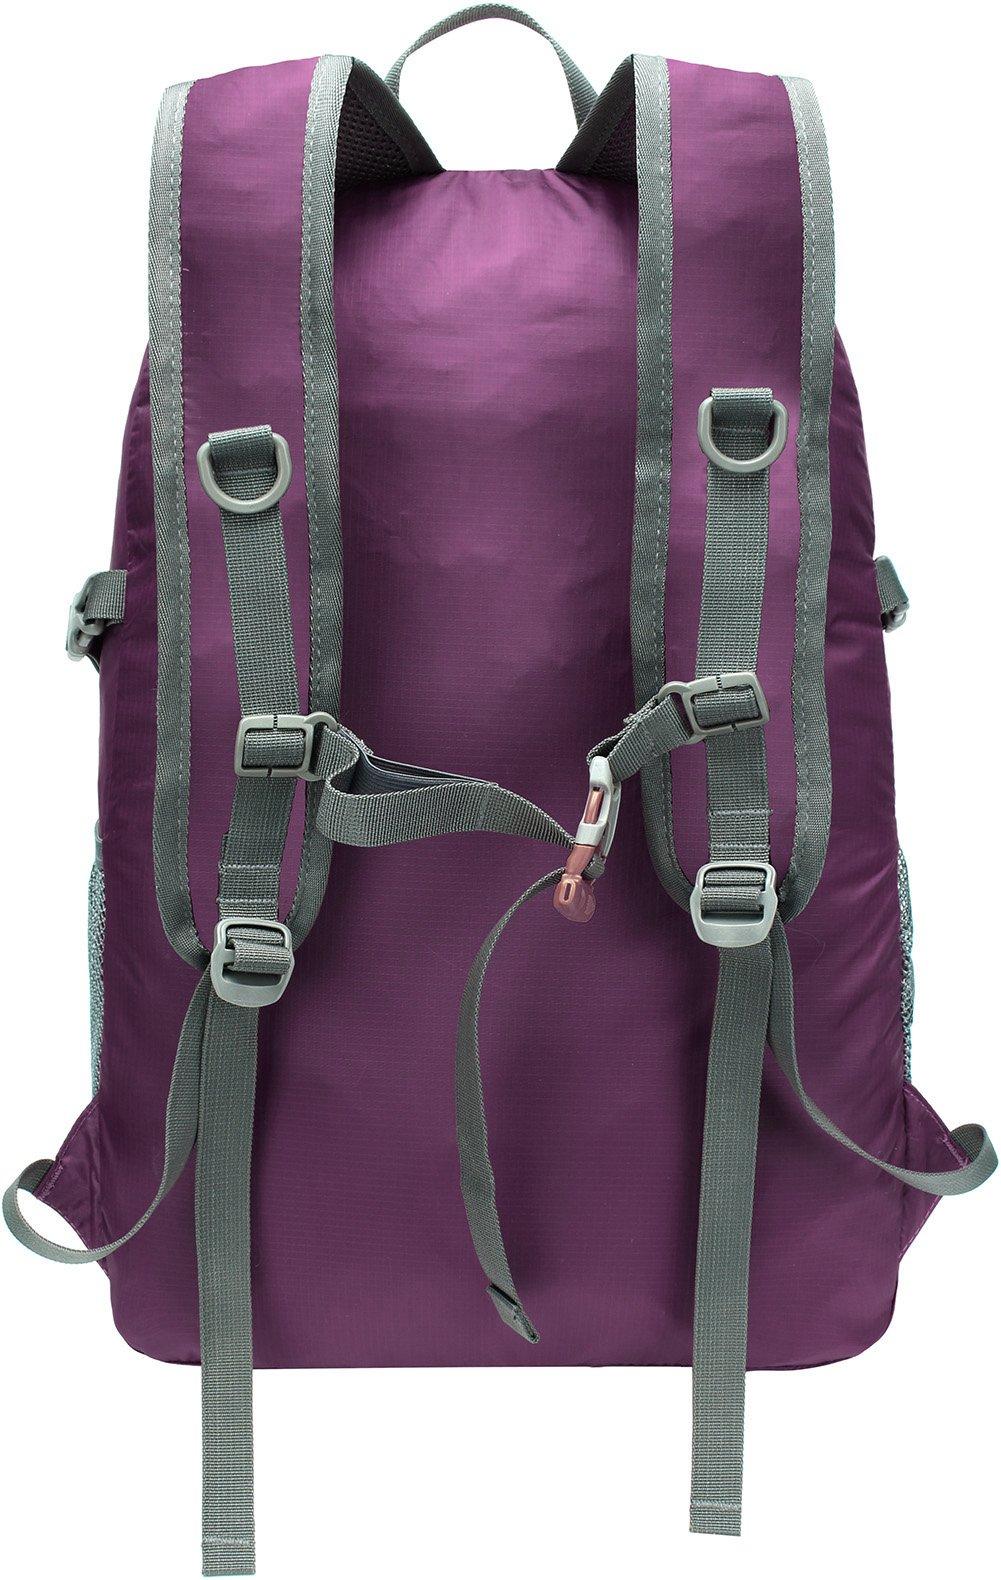 Mubasel Gear Backpack - Lightweight Backpacks for Travel Hiking - Daypack for Women Men (Purple) by Mubasel Gear (Image #2)